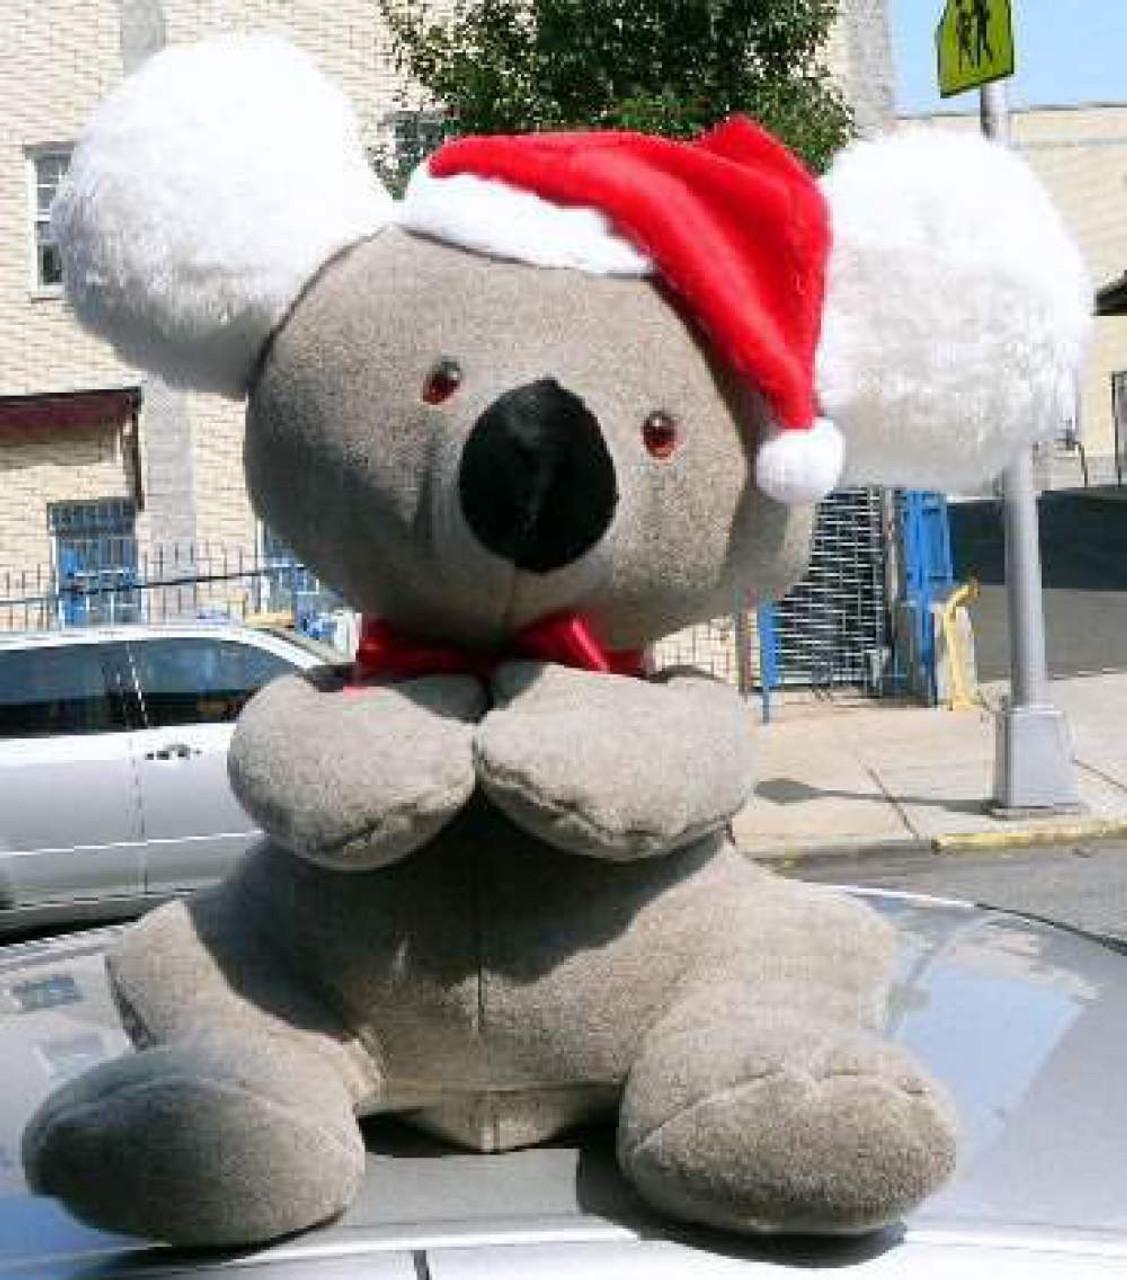 5724e850d55d2 American Made Big Stuffed Koala Bear 26 Inch Soft Wears Christmas Santa Hat  - Big Plush Personalized Giant Teddy Bears Custom Stuffed Animals